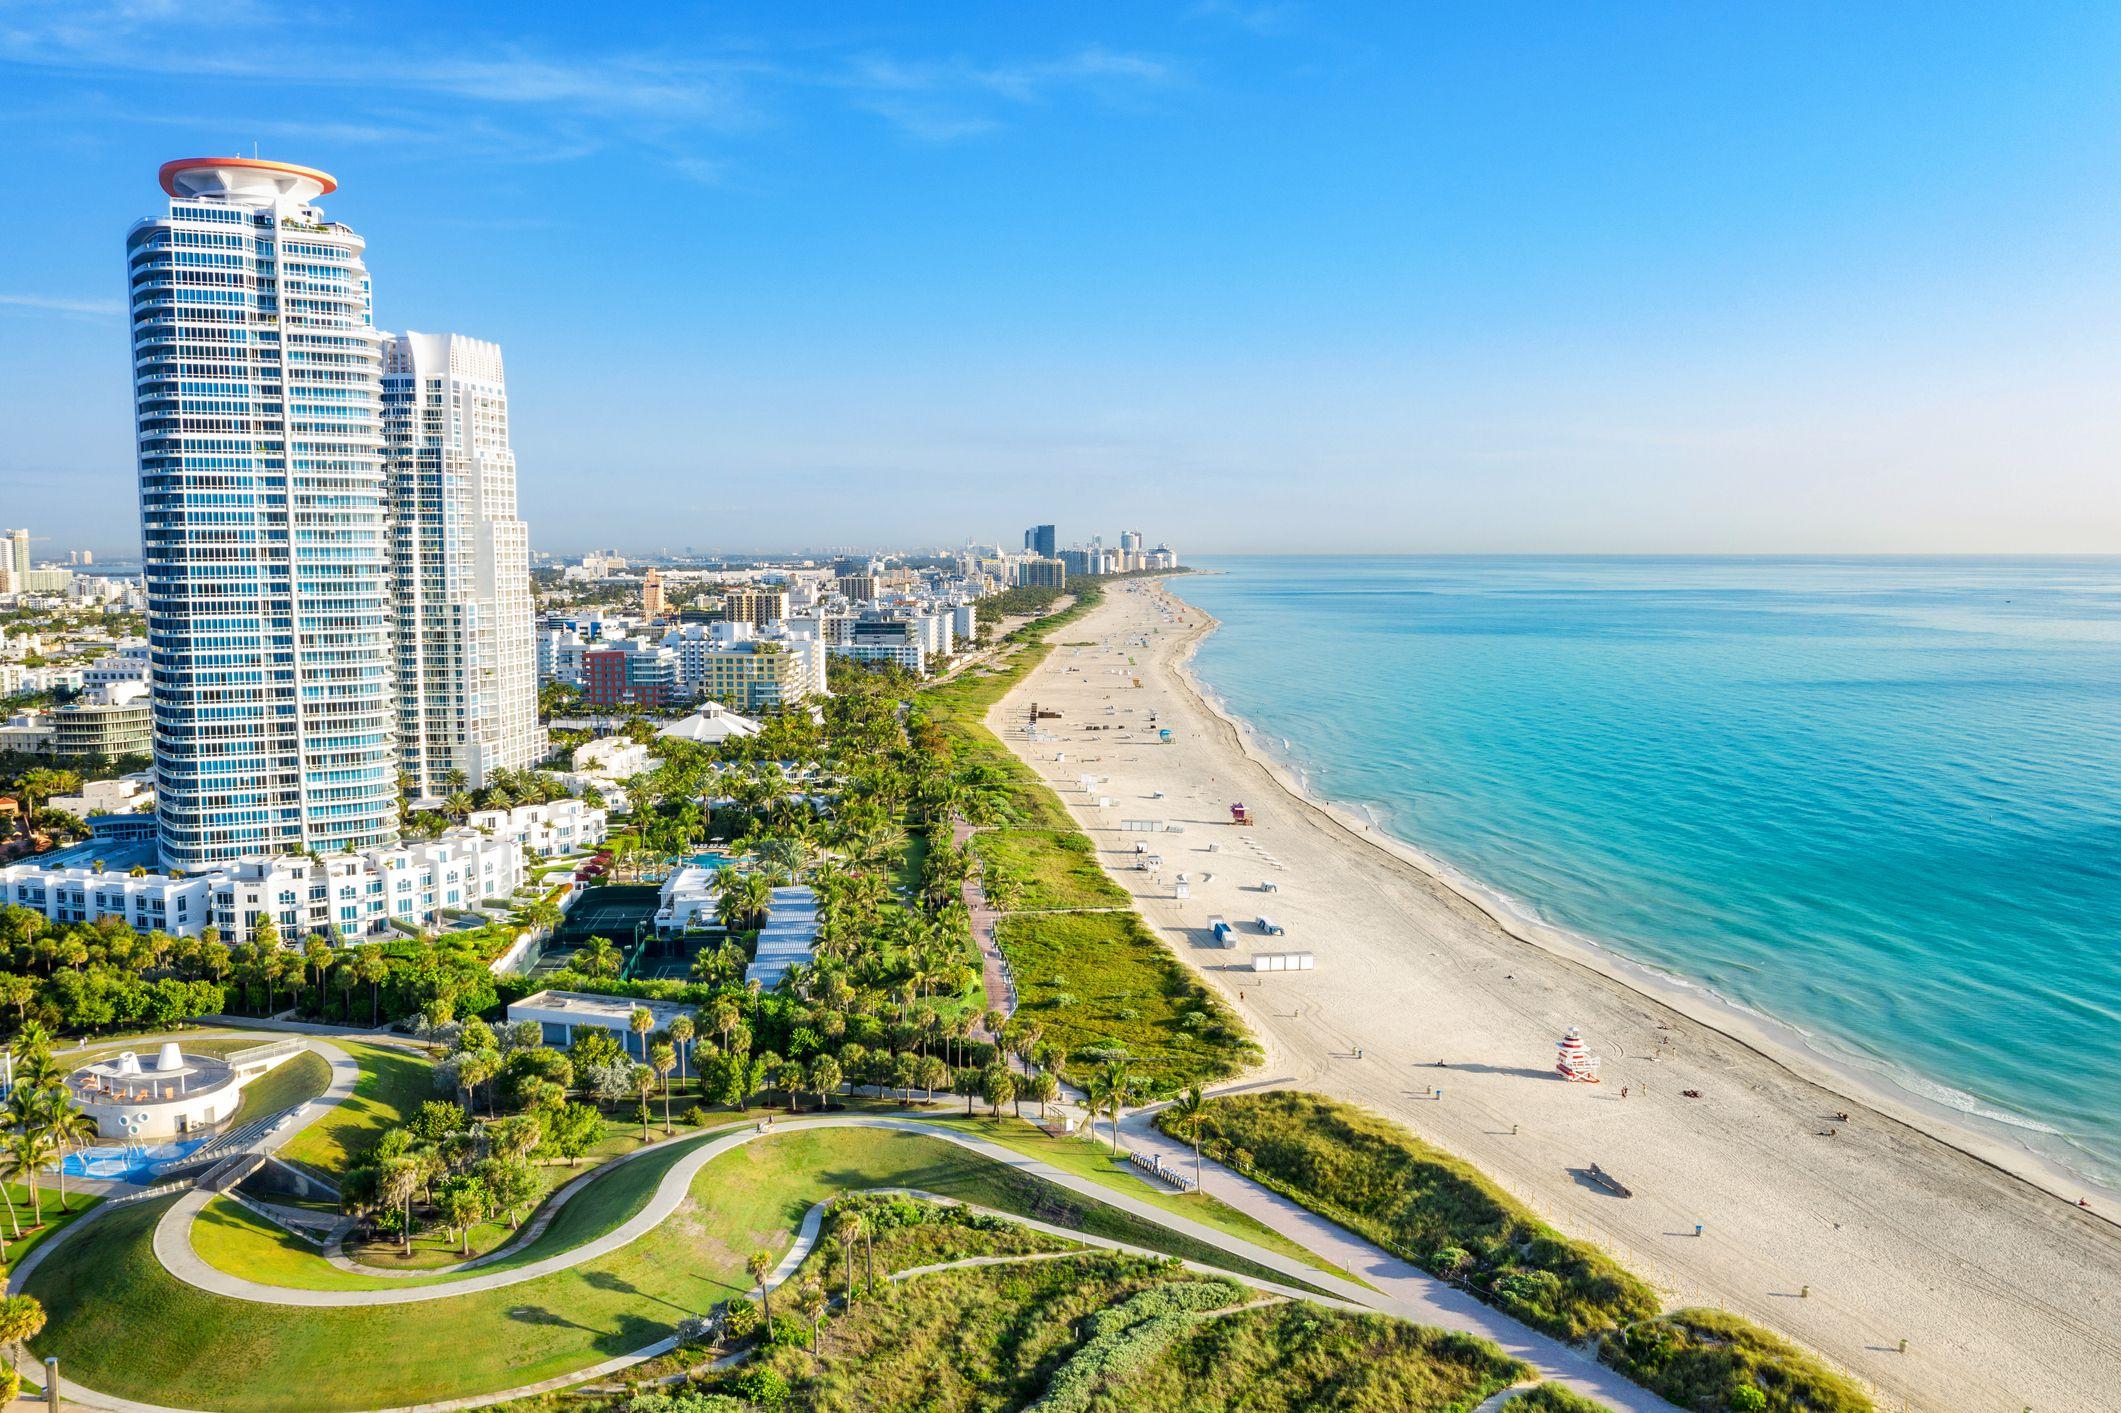 south-beach-miami-from-south-pointe-park--florida--usa-1137673992-0dc4c290e2764b178a5ab5be28dbd2d7